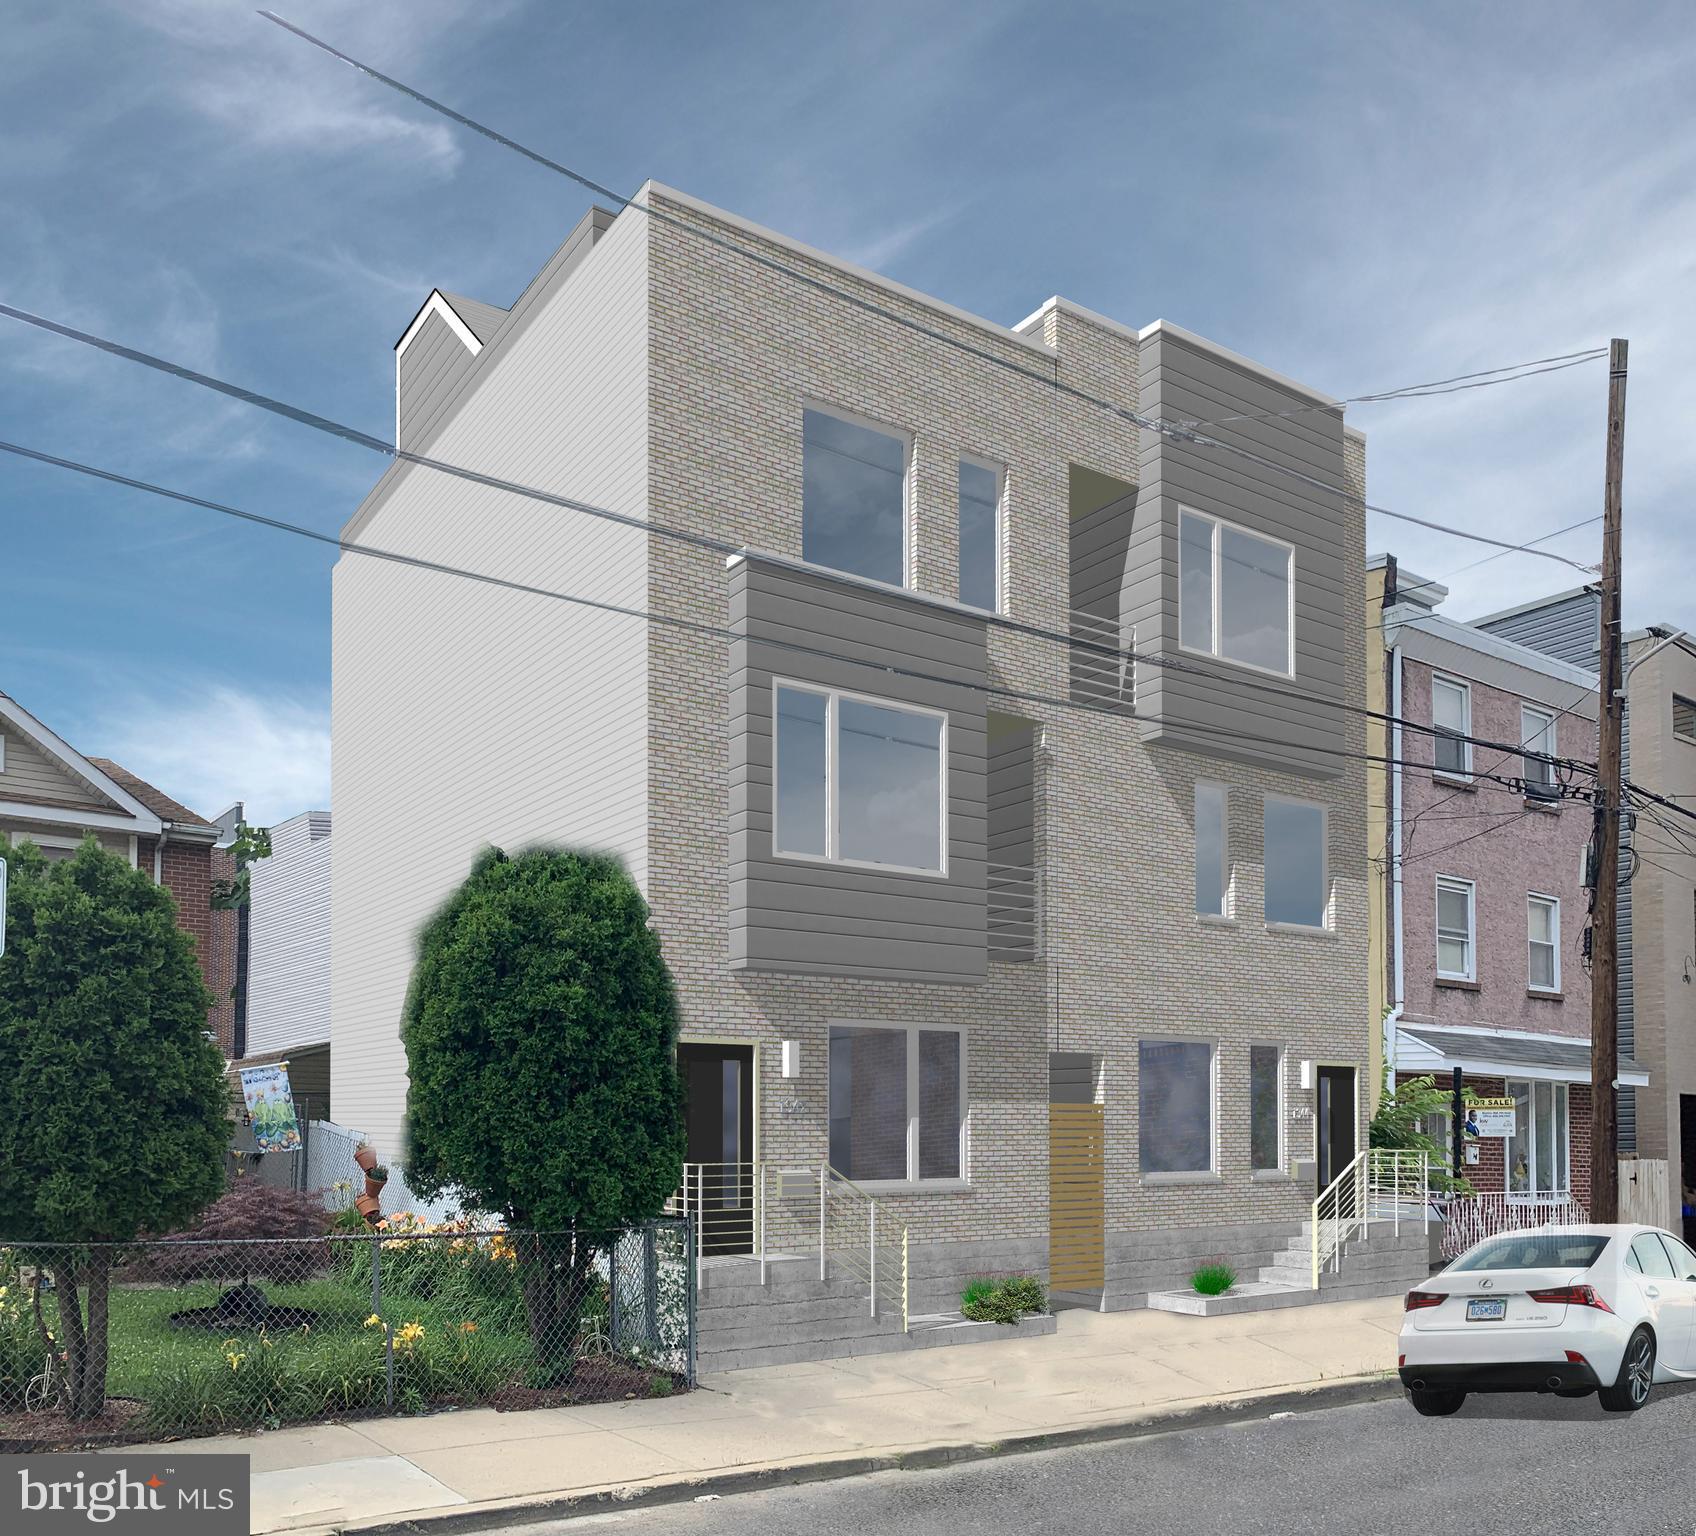 1344 N HANCOCK STREET, PHILADELPHIA, PA 19122